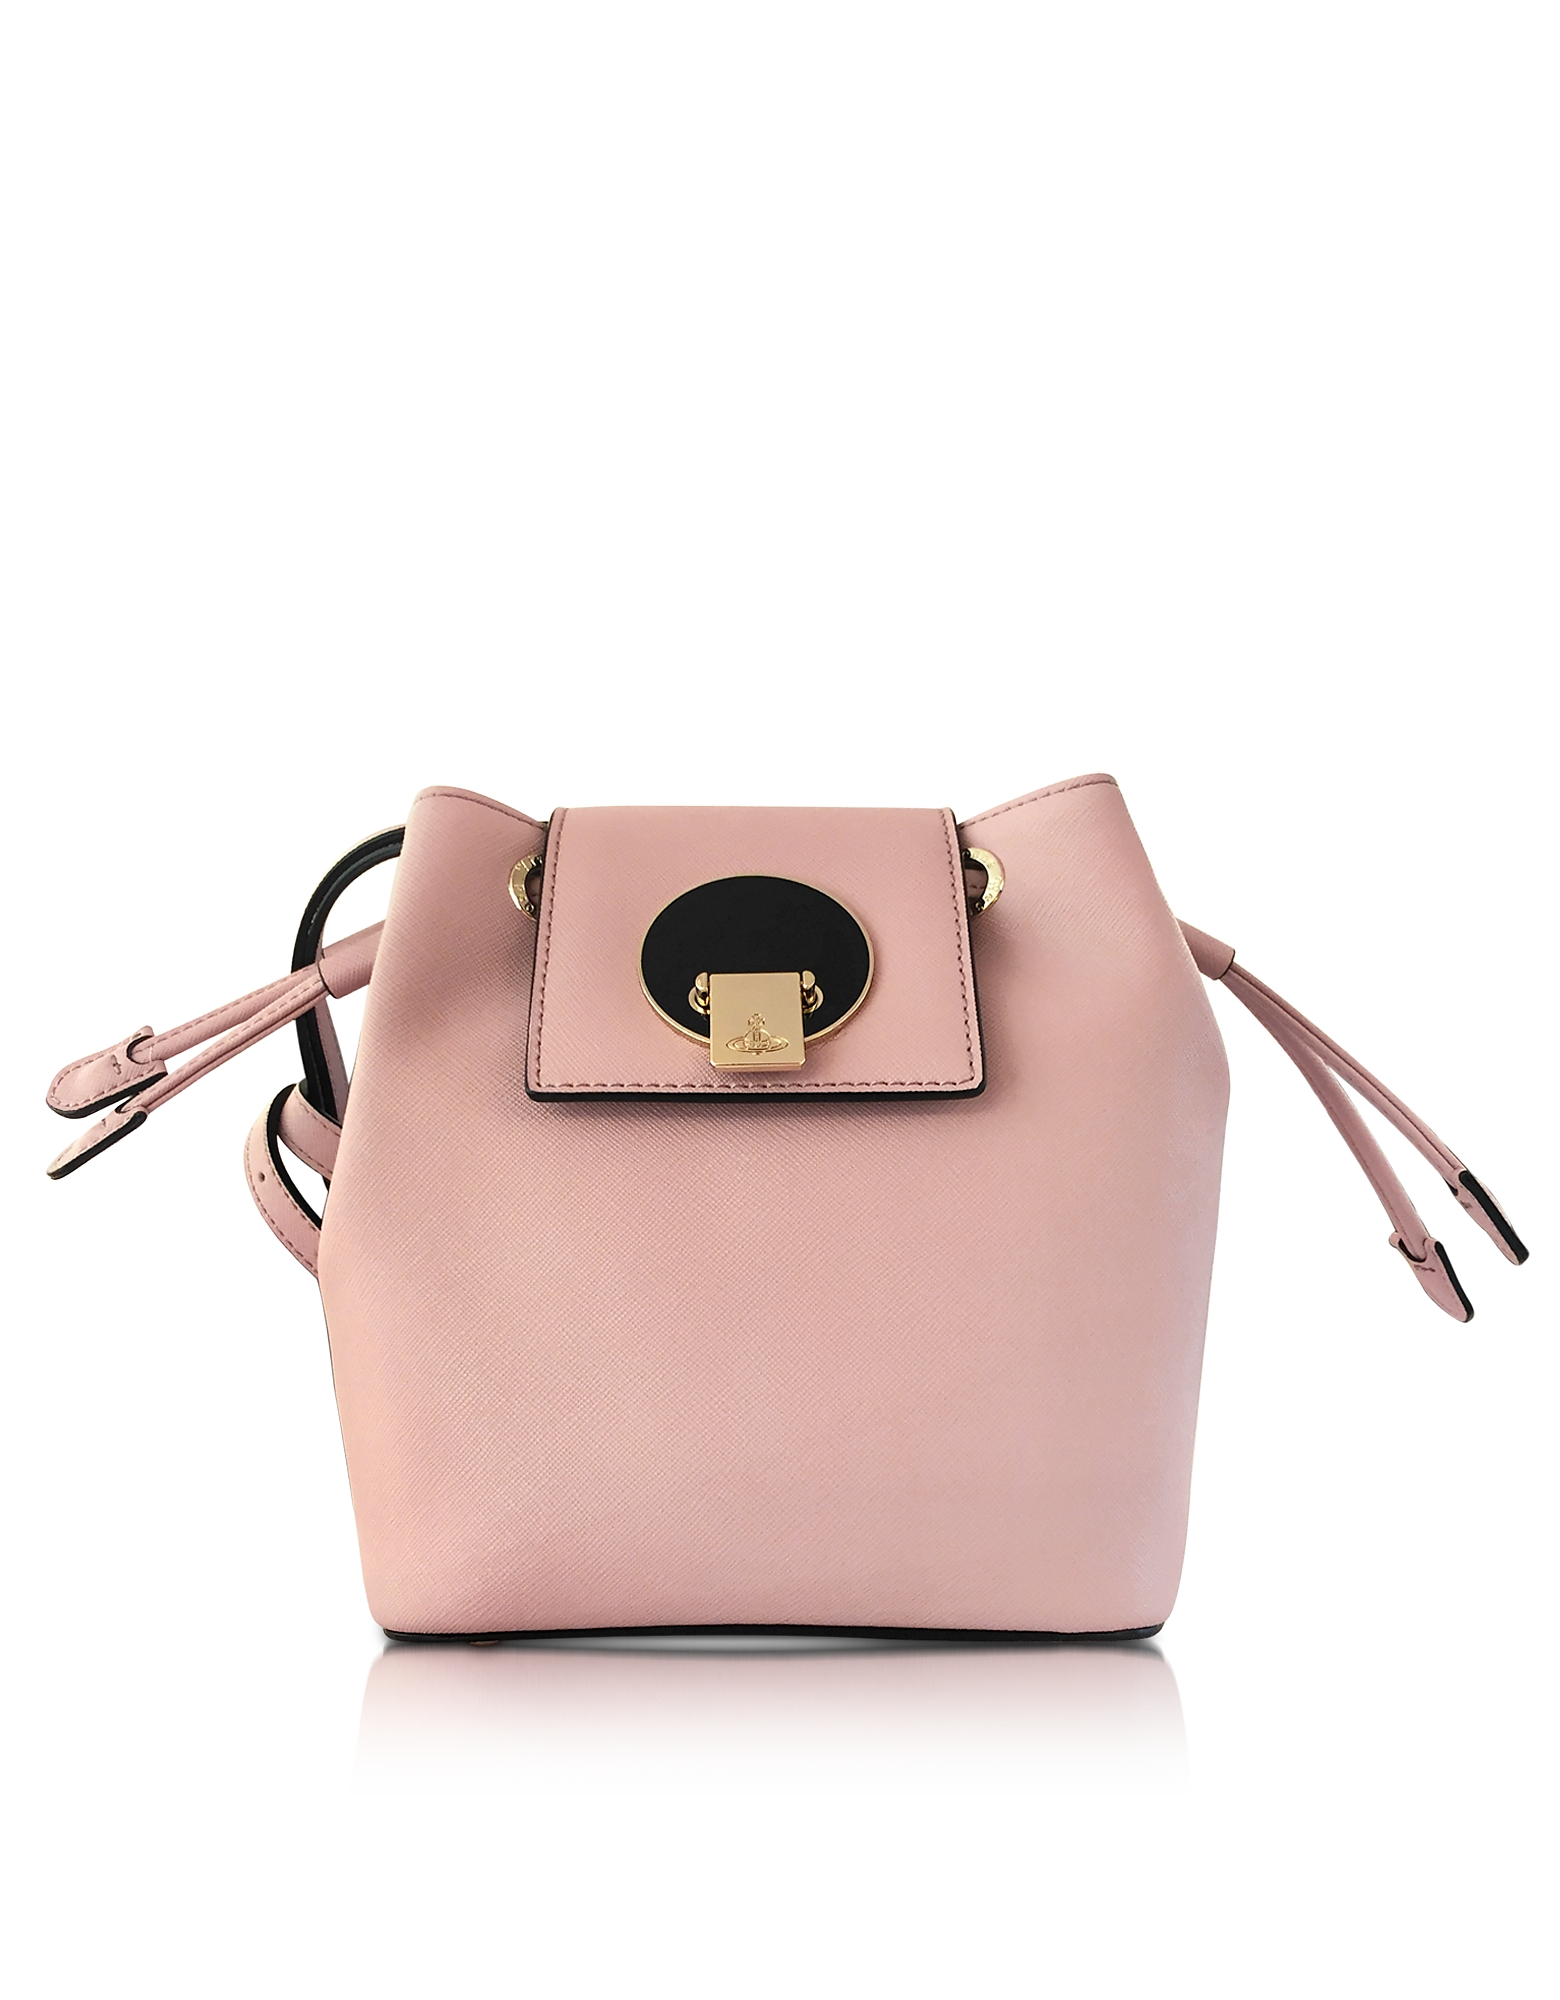 Vivienne Westwood Opio Pink Saffiano Large Mini Bucket Bag